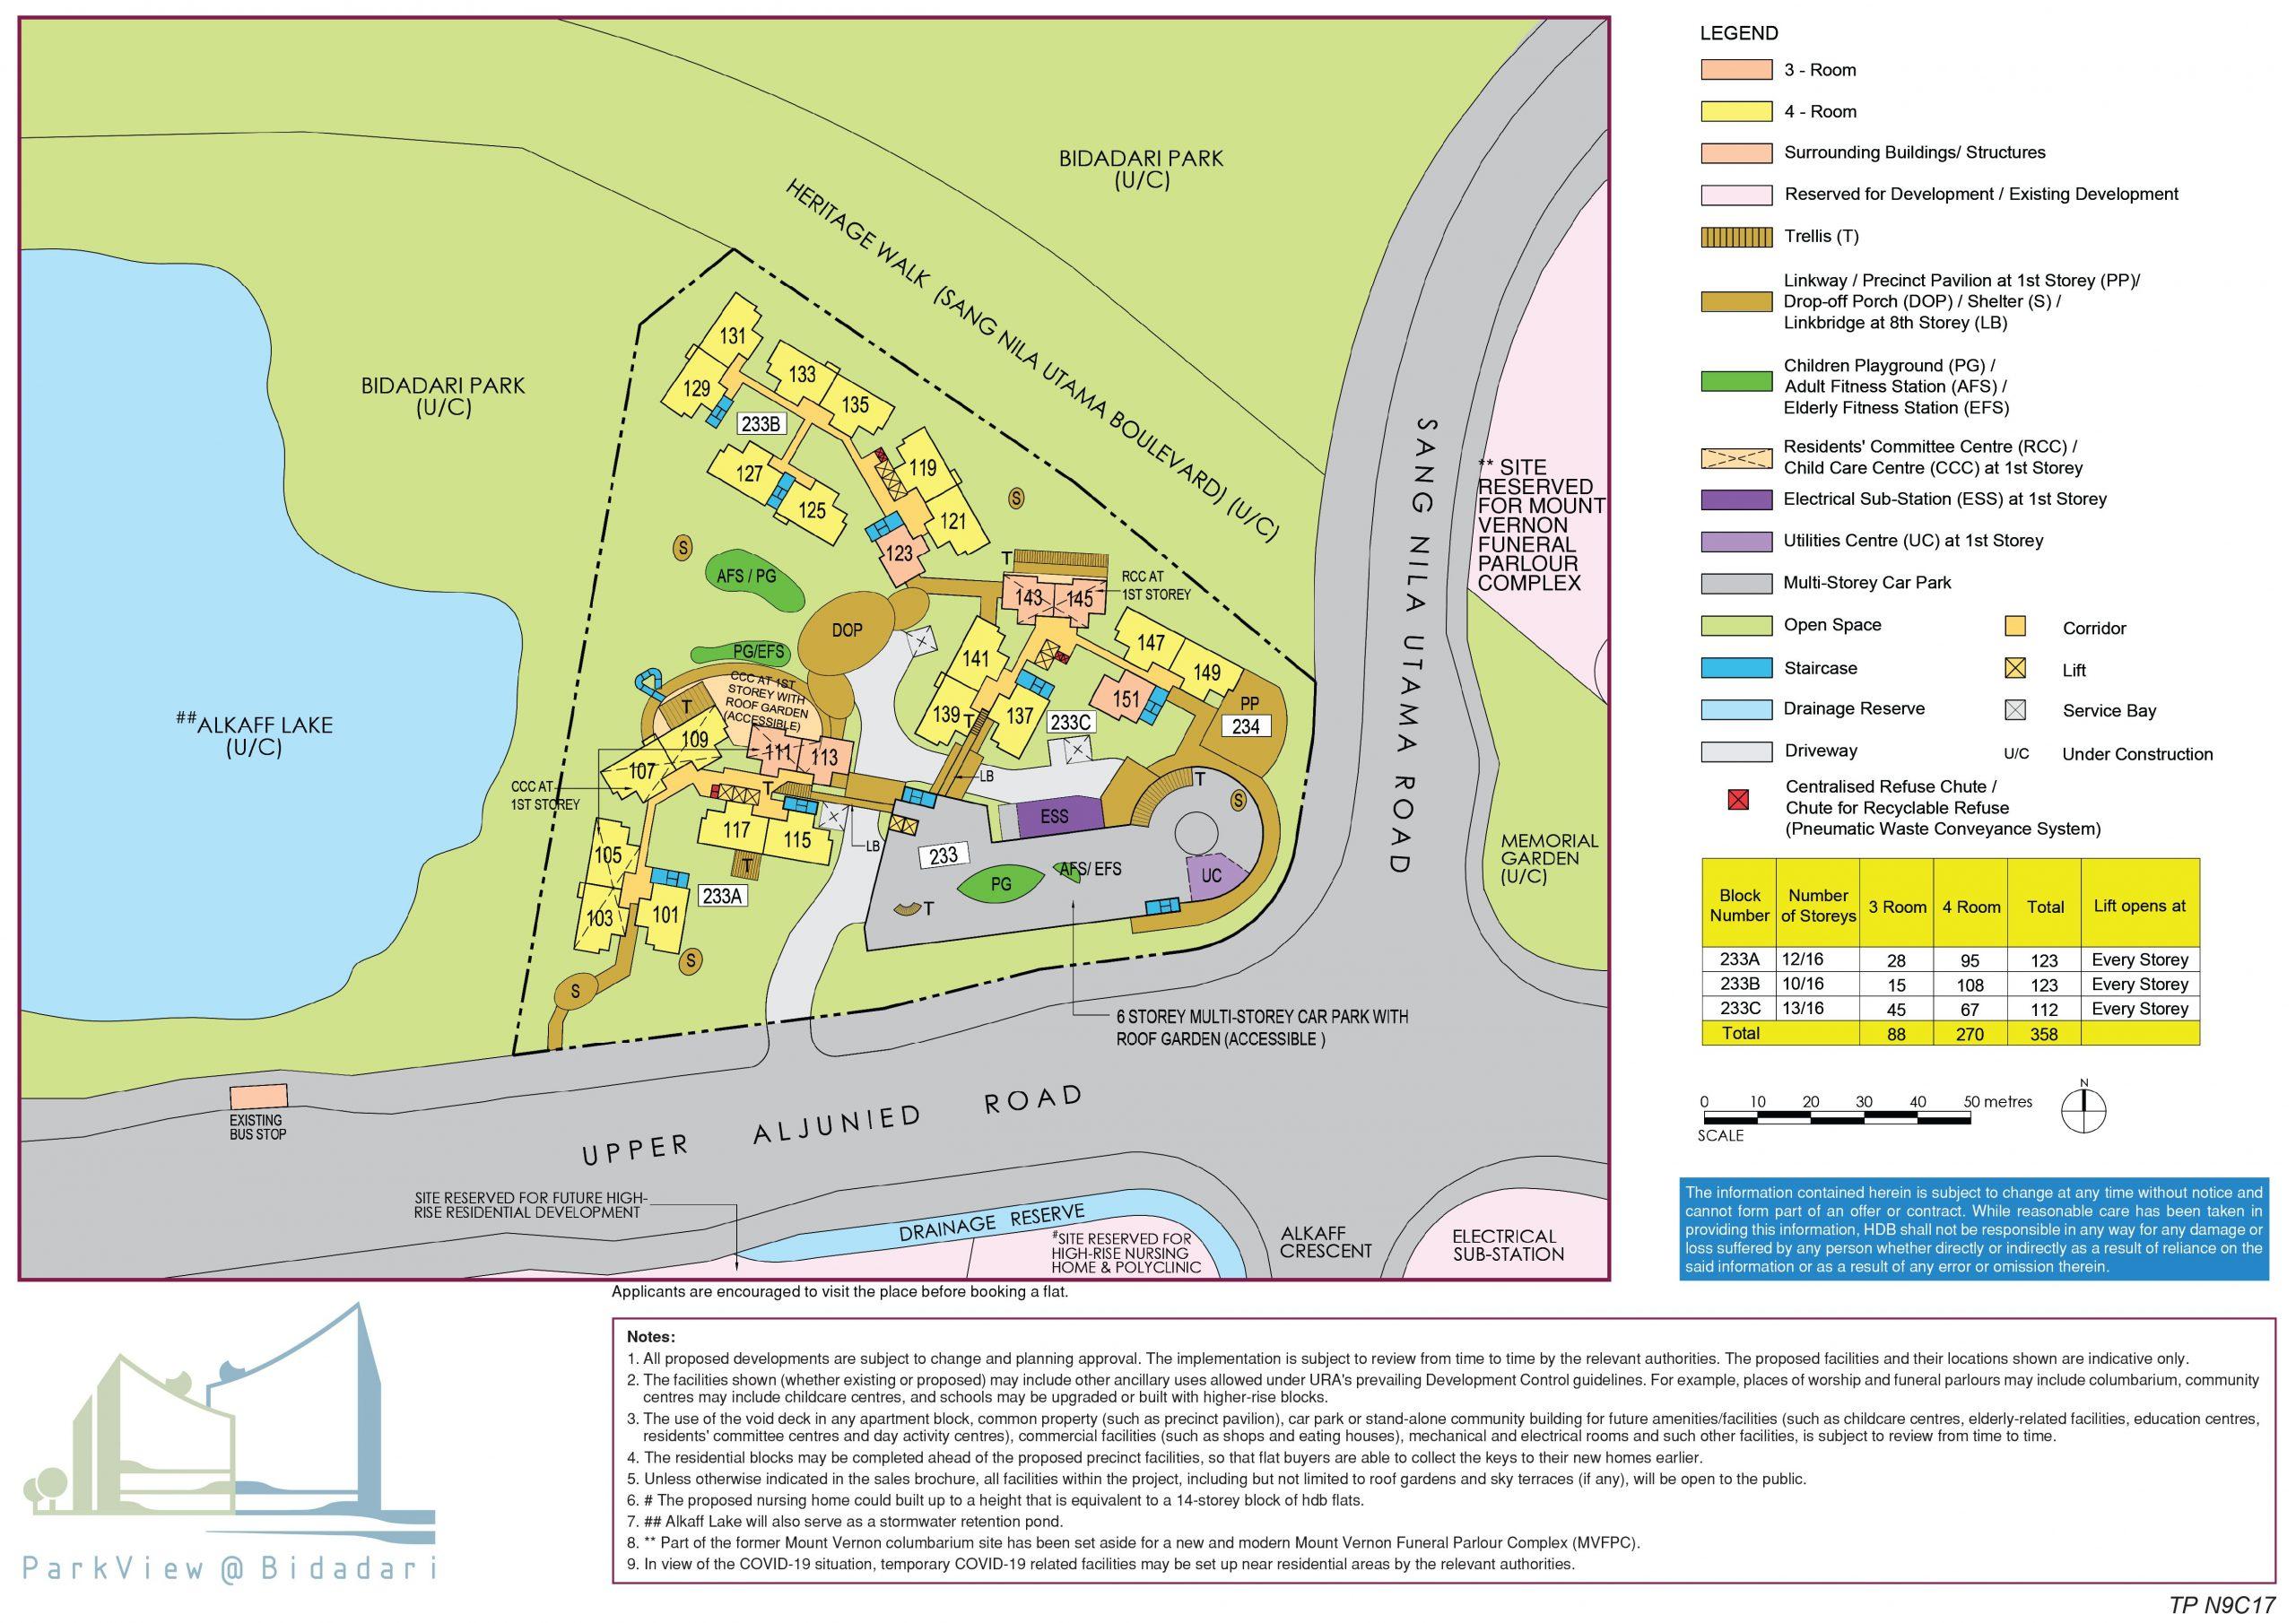 parkview at bidadari bto site plan